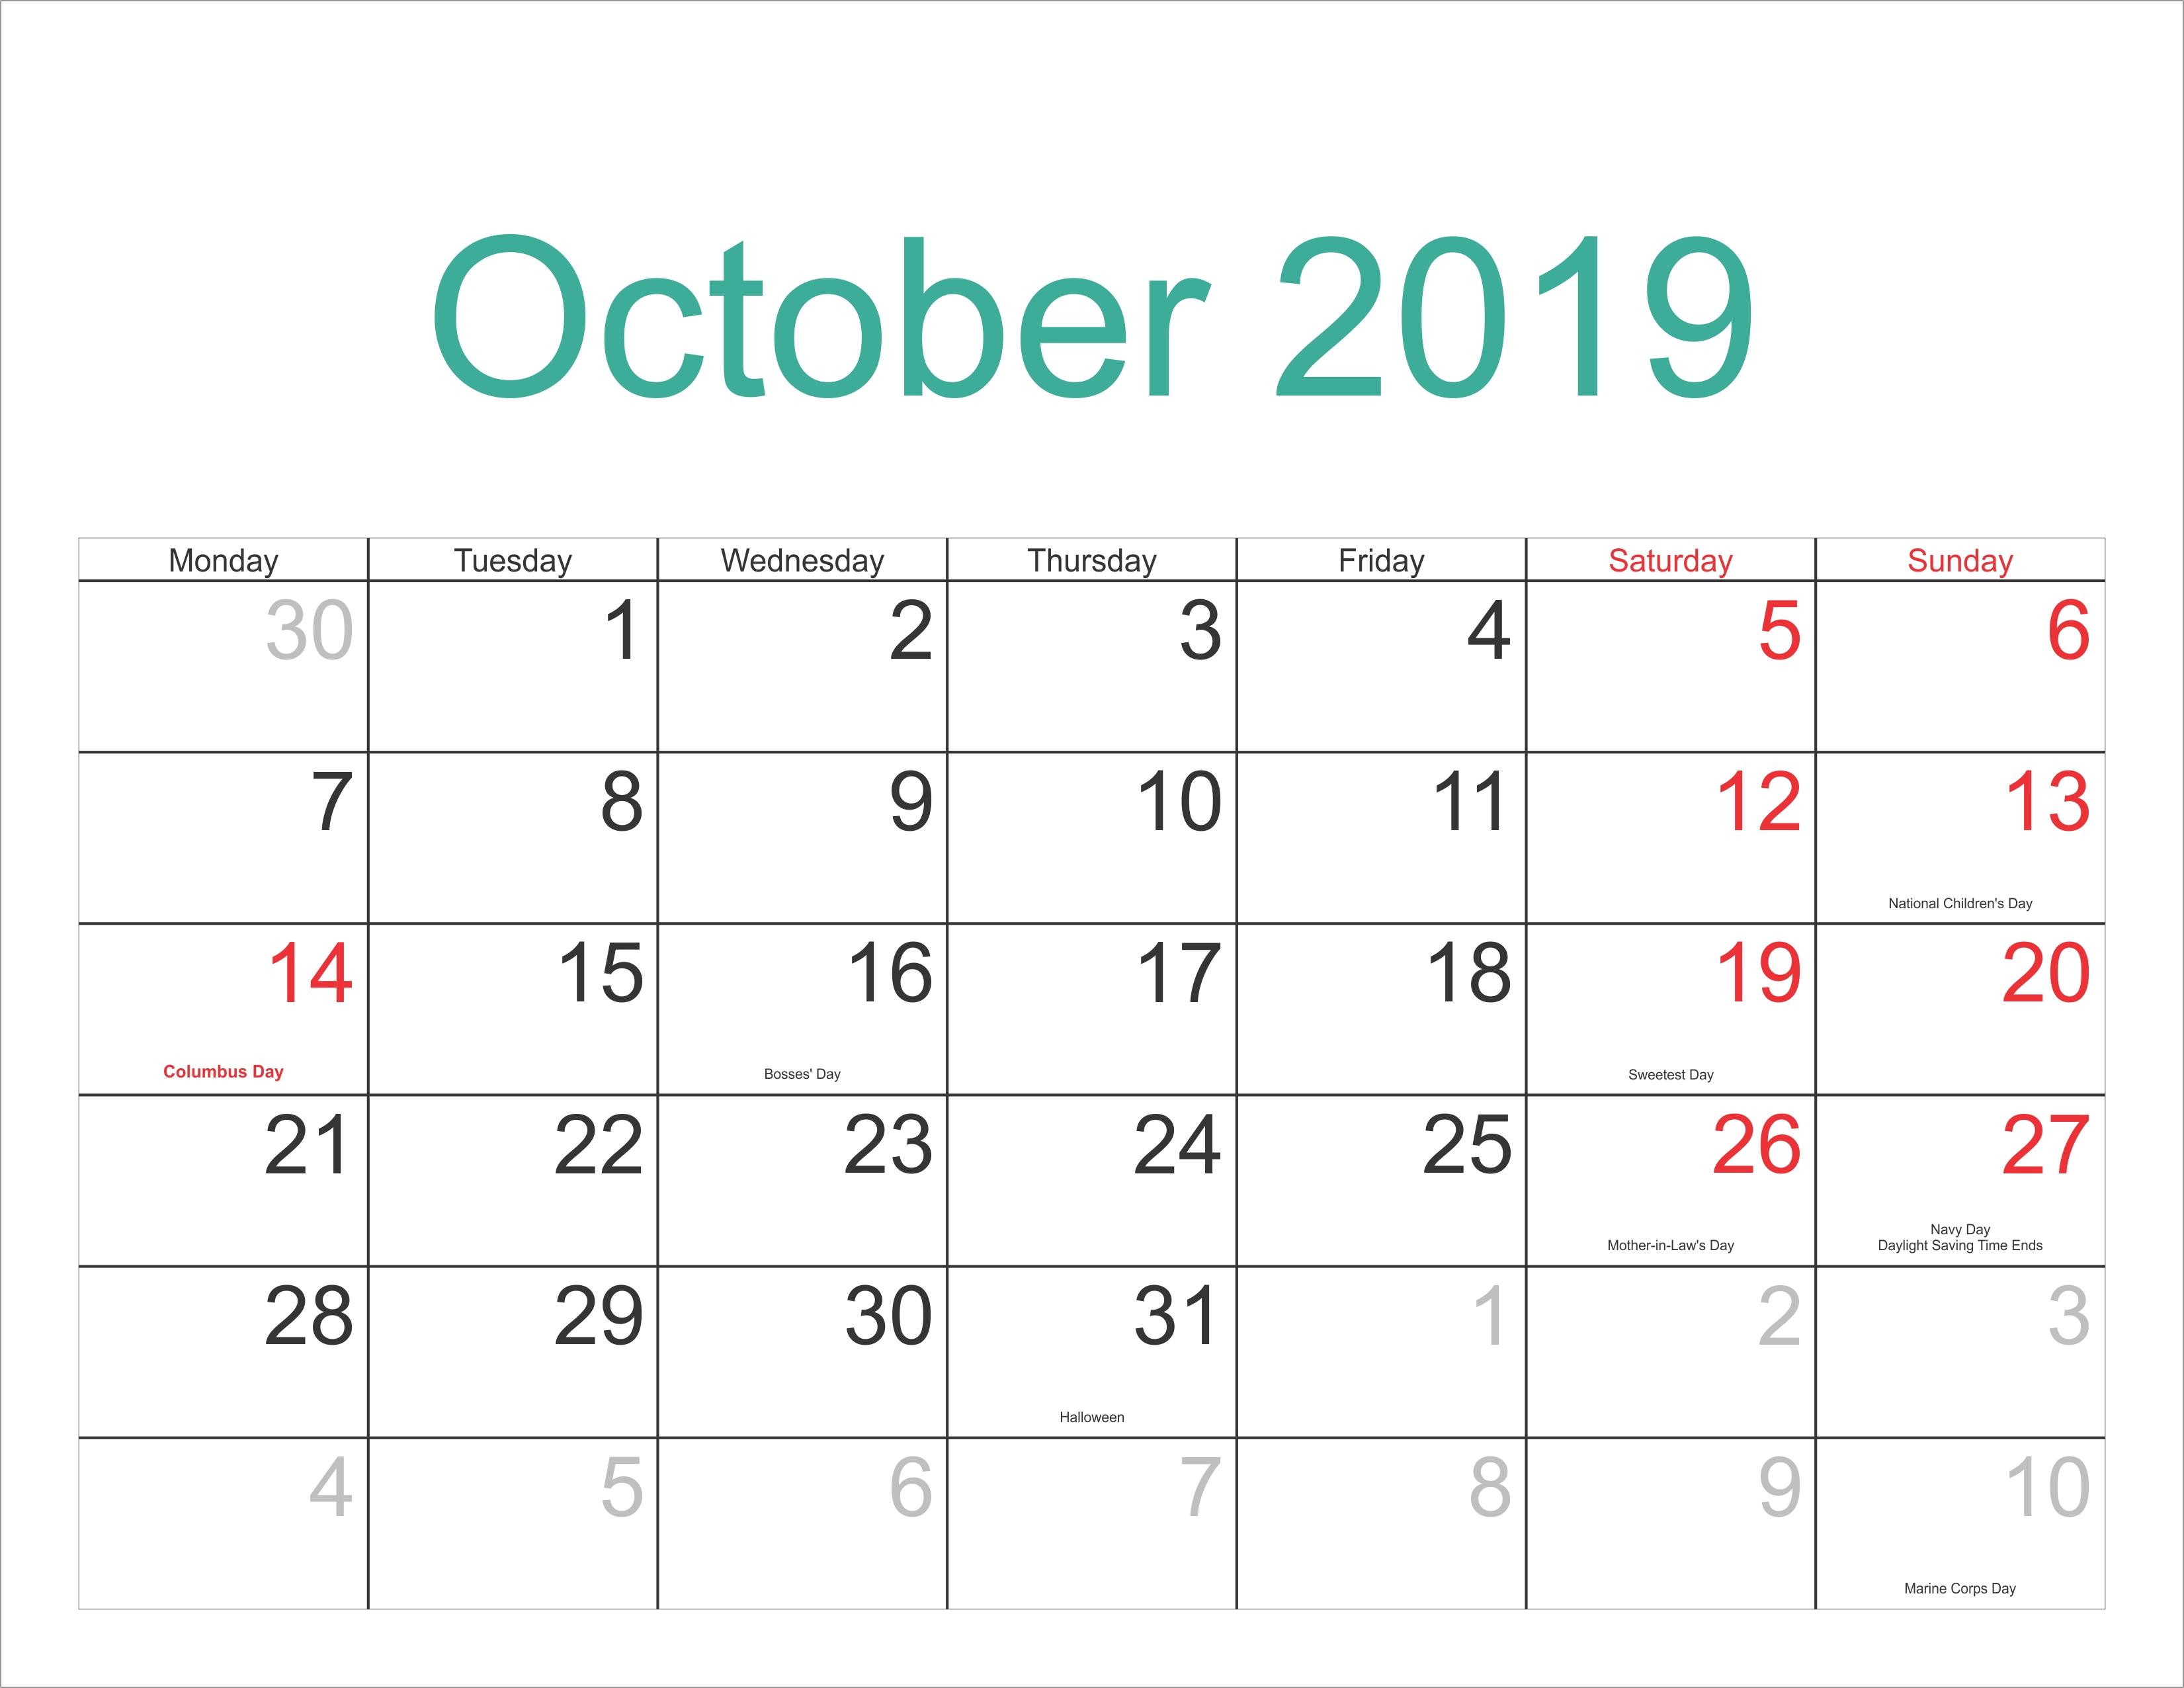 October 2018 Printable Calendar – October 2018 Calendar Template Calendar 2019 Schedule